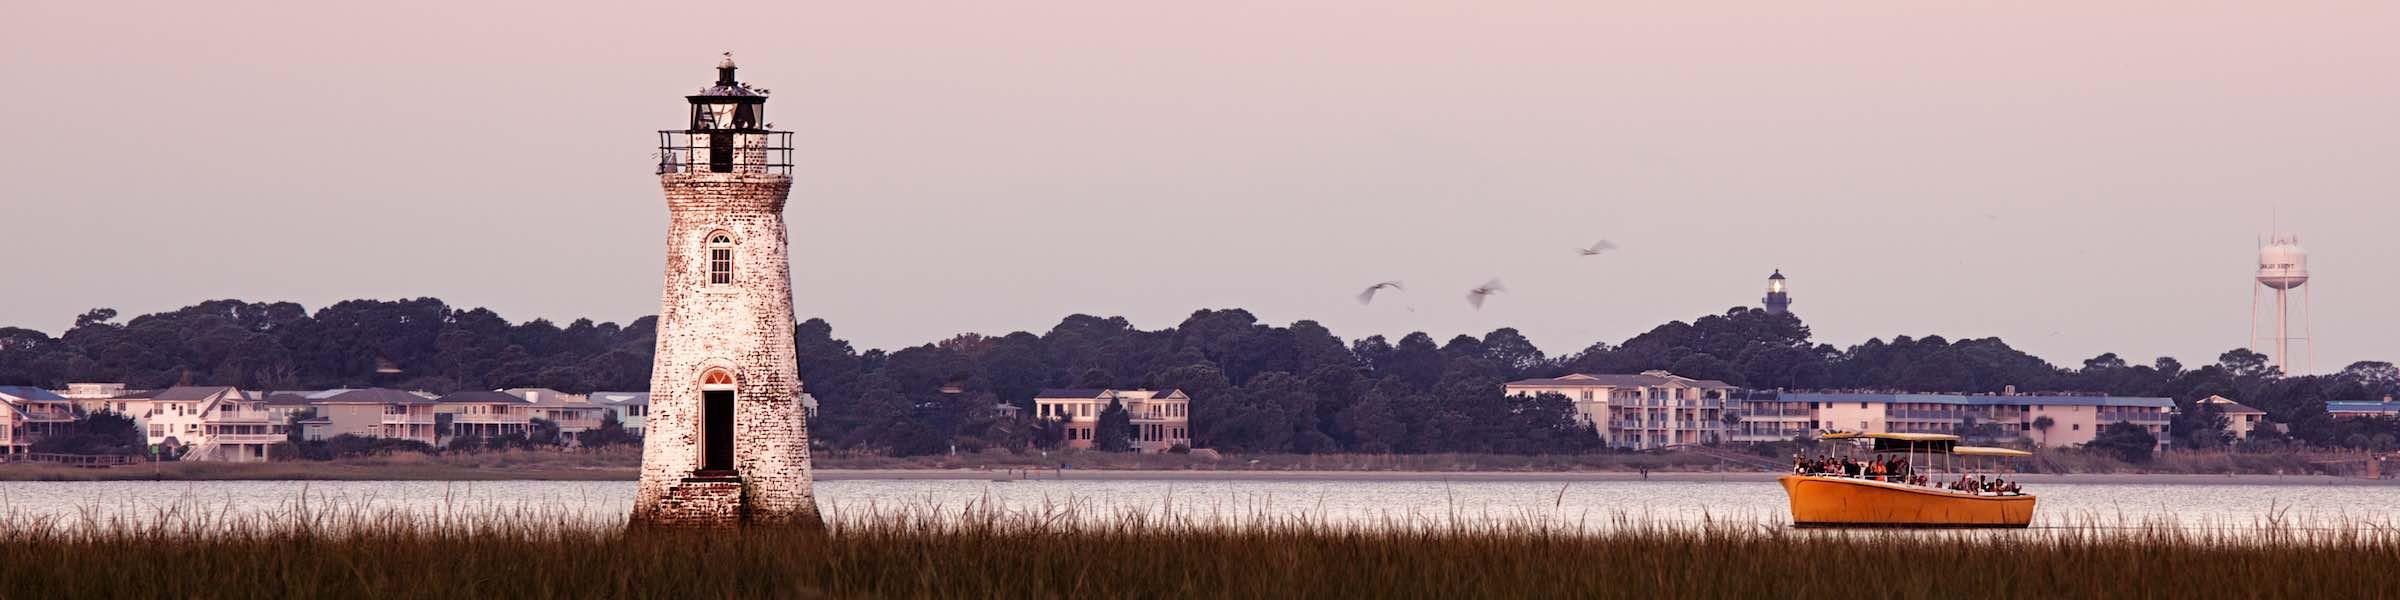 Sunset view of Cockspur Island Lighthouse and Tybee Island, GA.